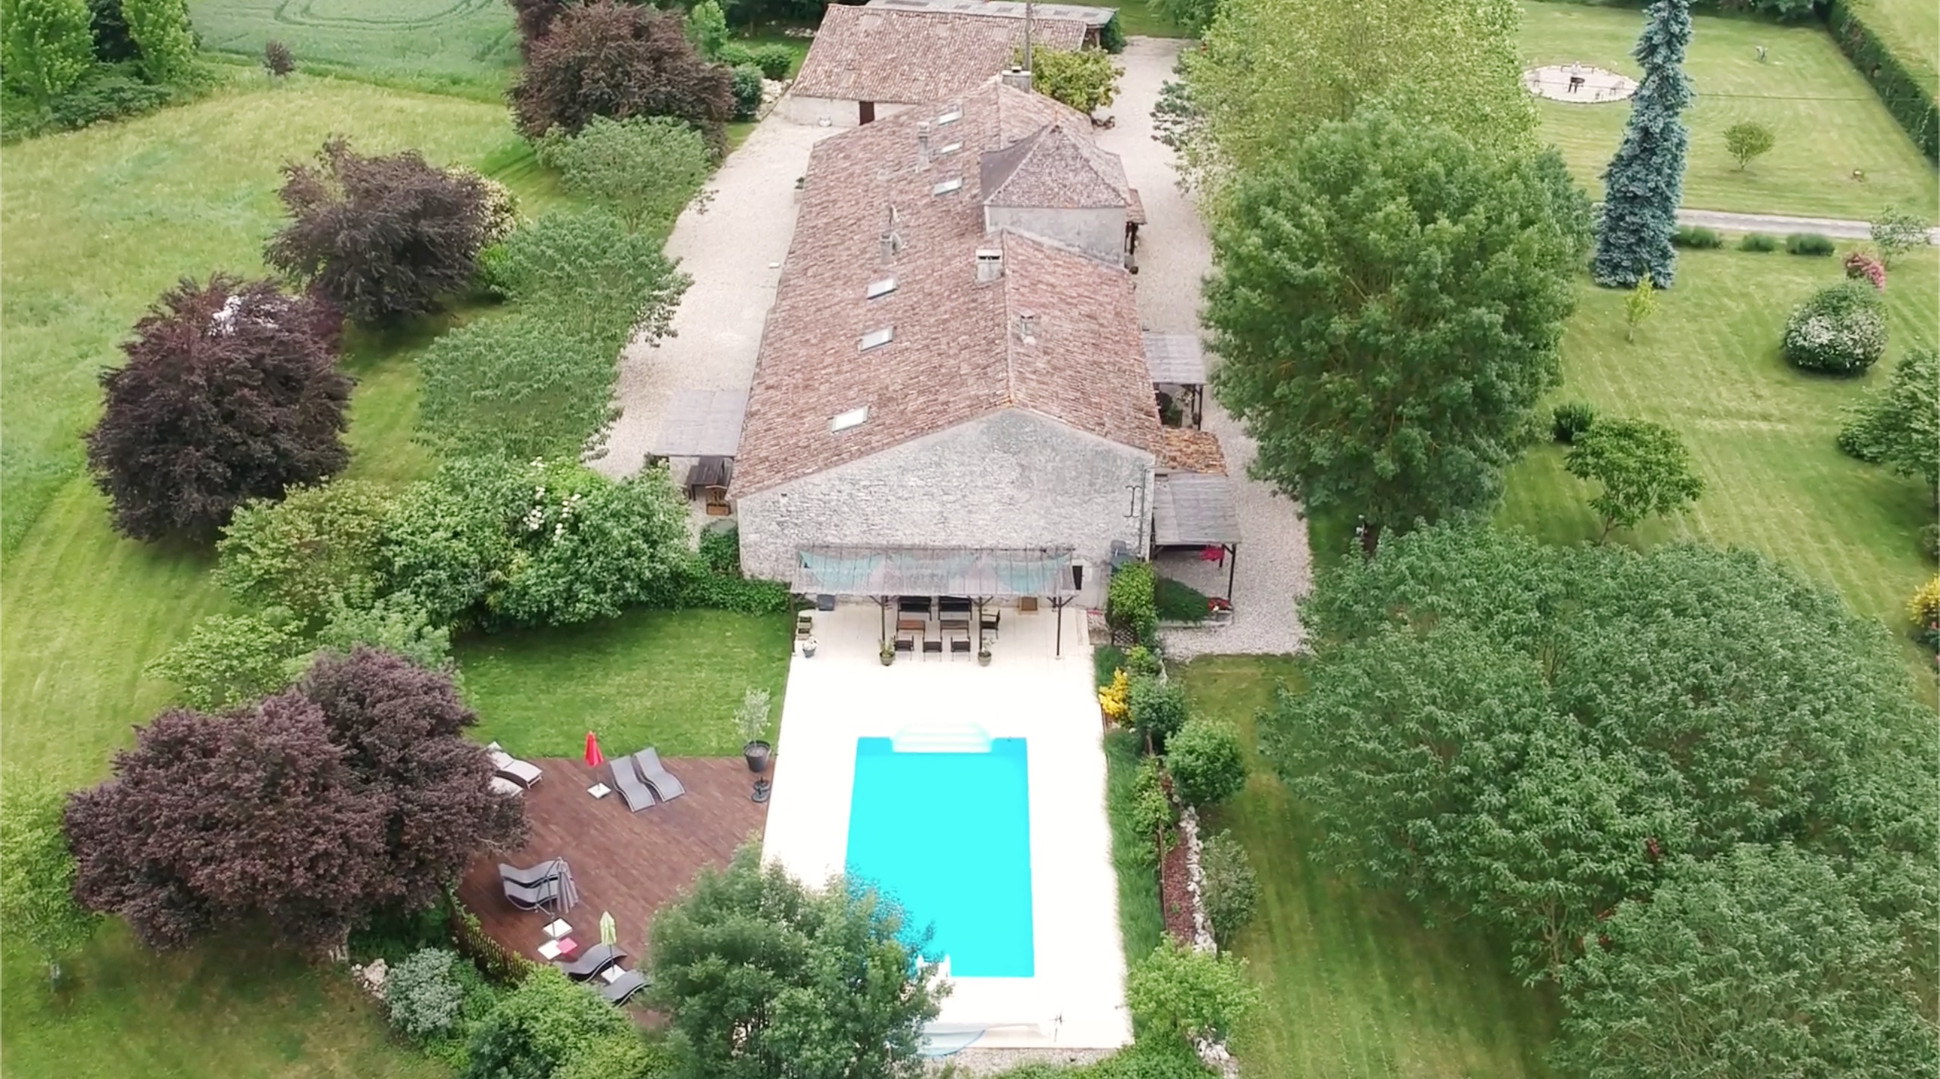 Garrigue drone image pool view 2019.